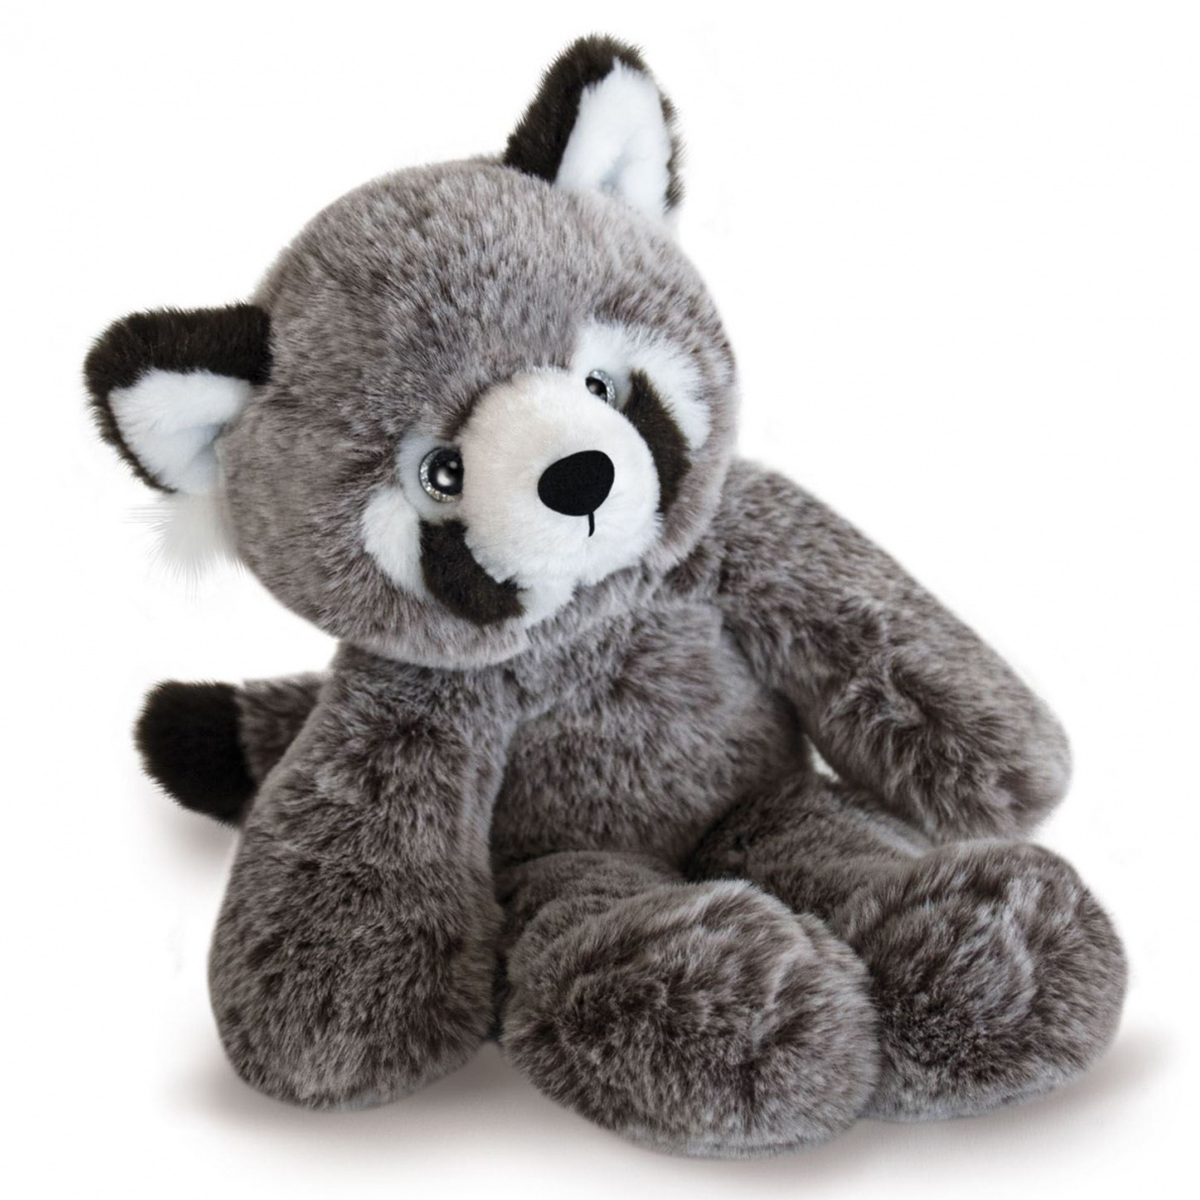 Peluche Peluche Sweety Mousse Panda Roux - Moyen Peluche Panda Roux Sweety Mousse 25 cm